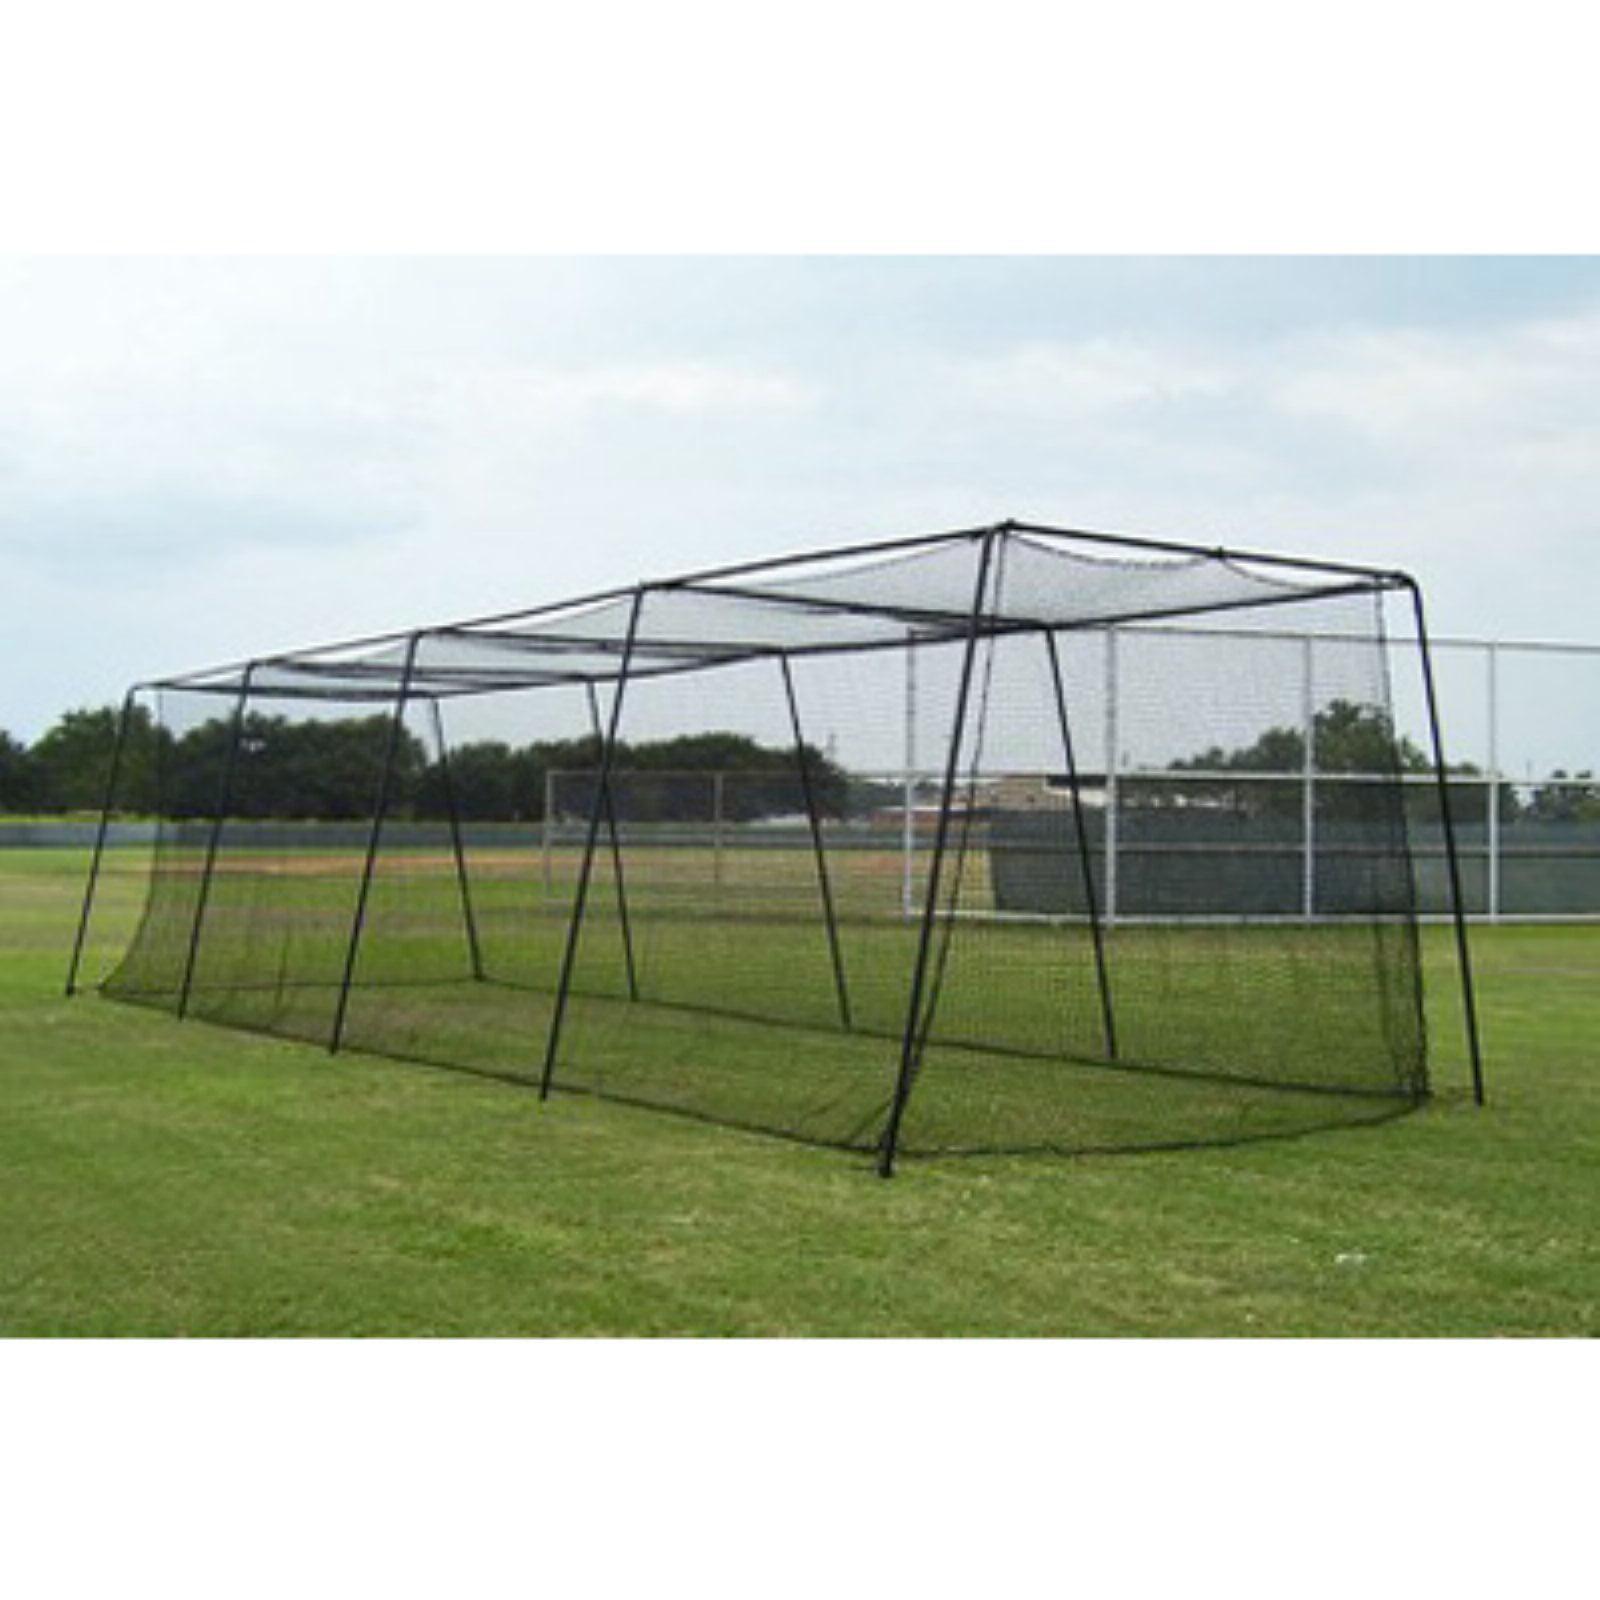 Muhl Sports Baseball Batting Cage - 70 Foot with #45 Net